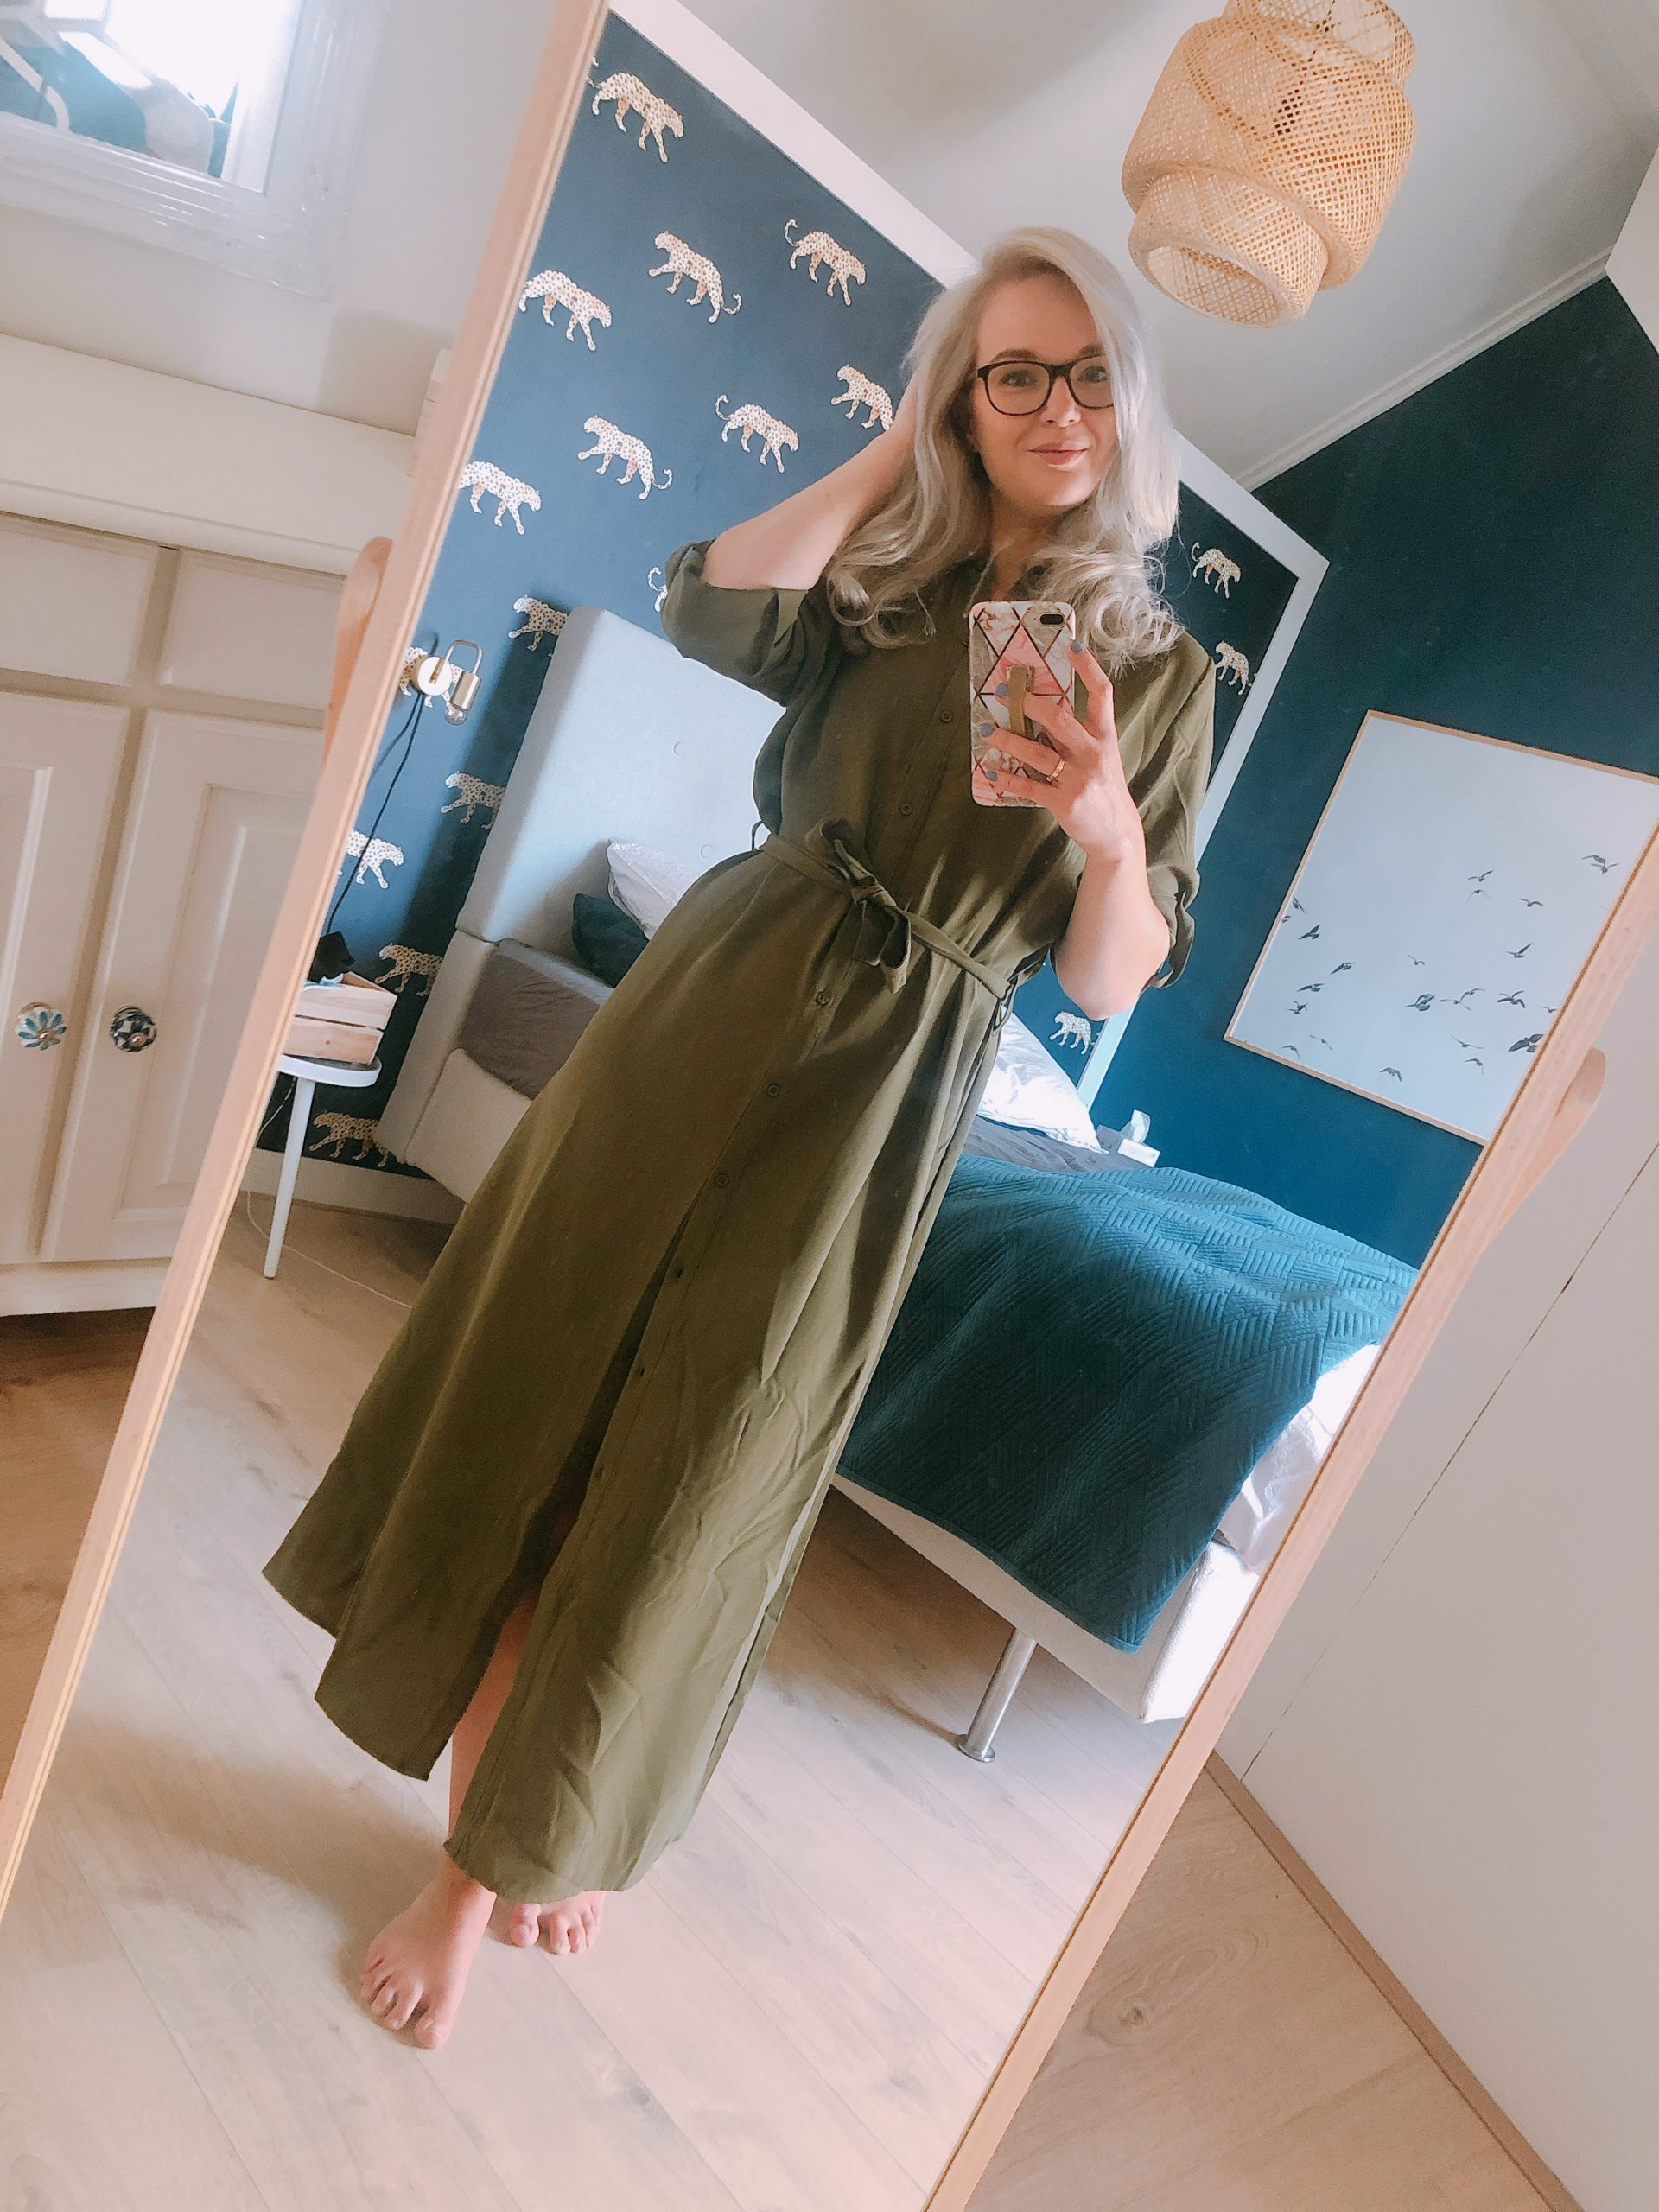 IMG 8069 scaled - Elise's Weekly Pictorama #34